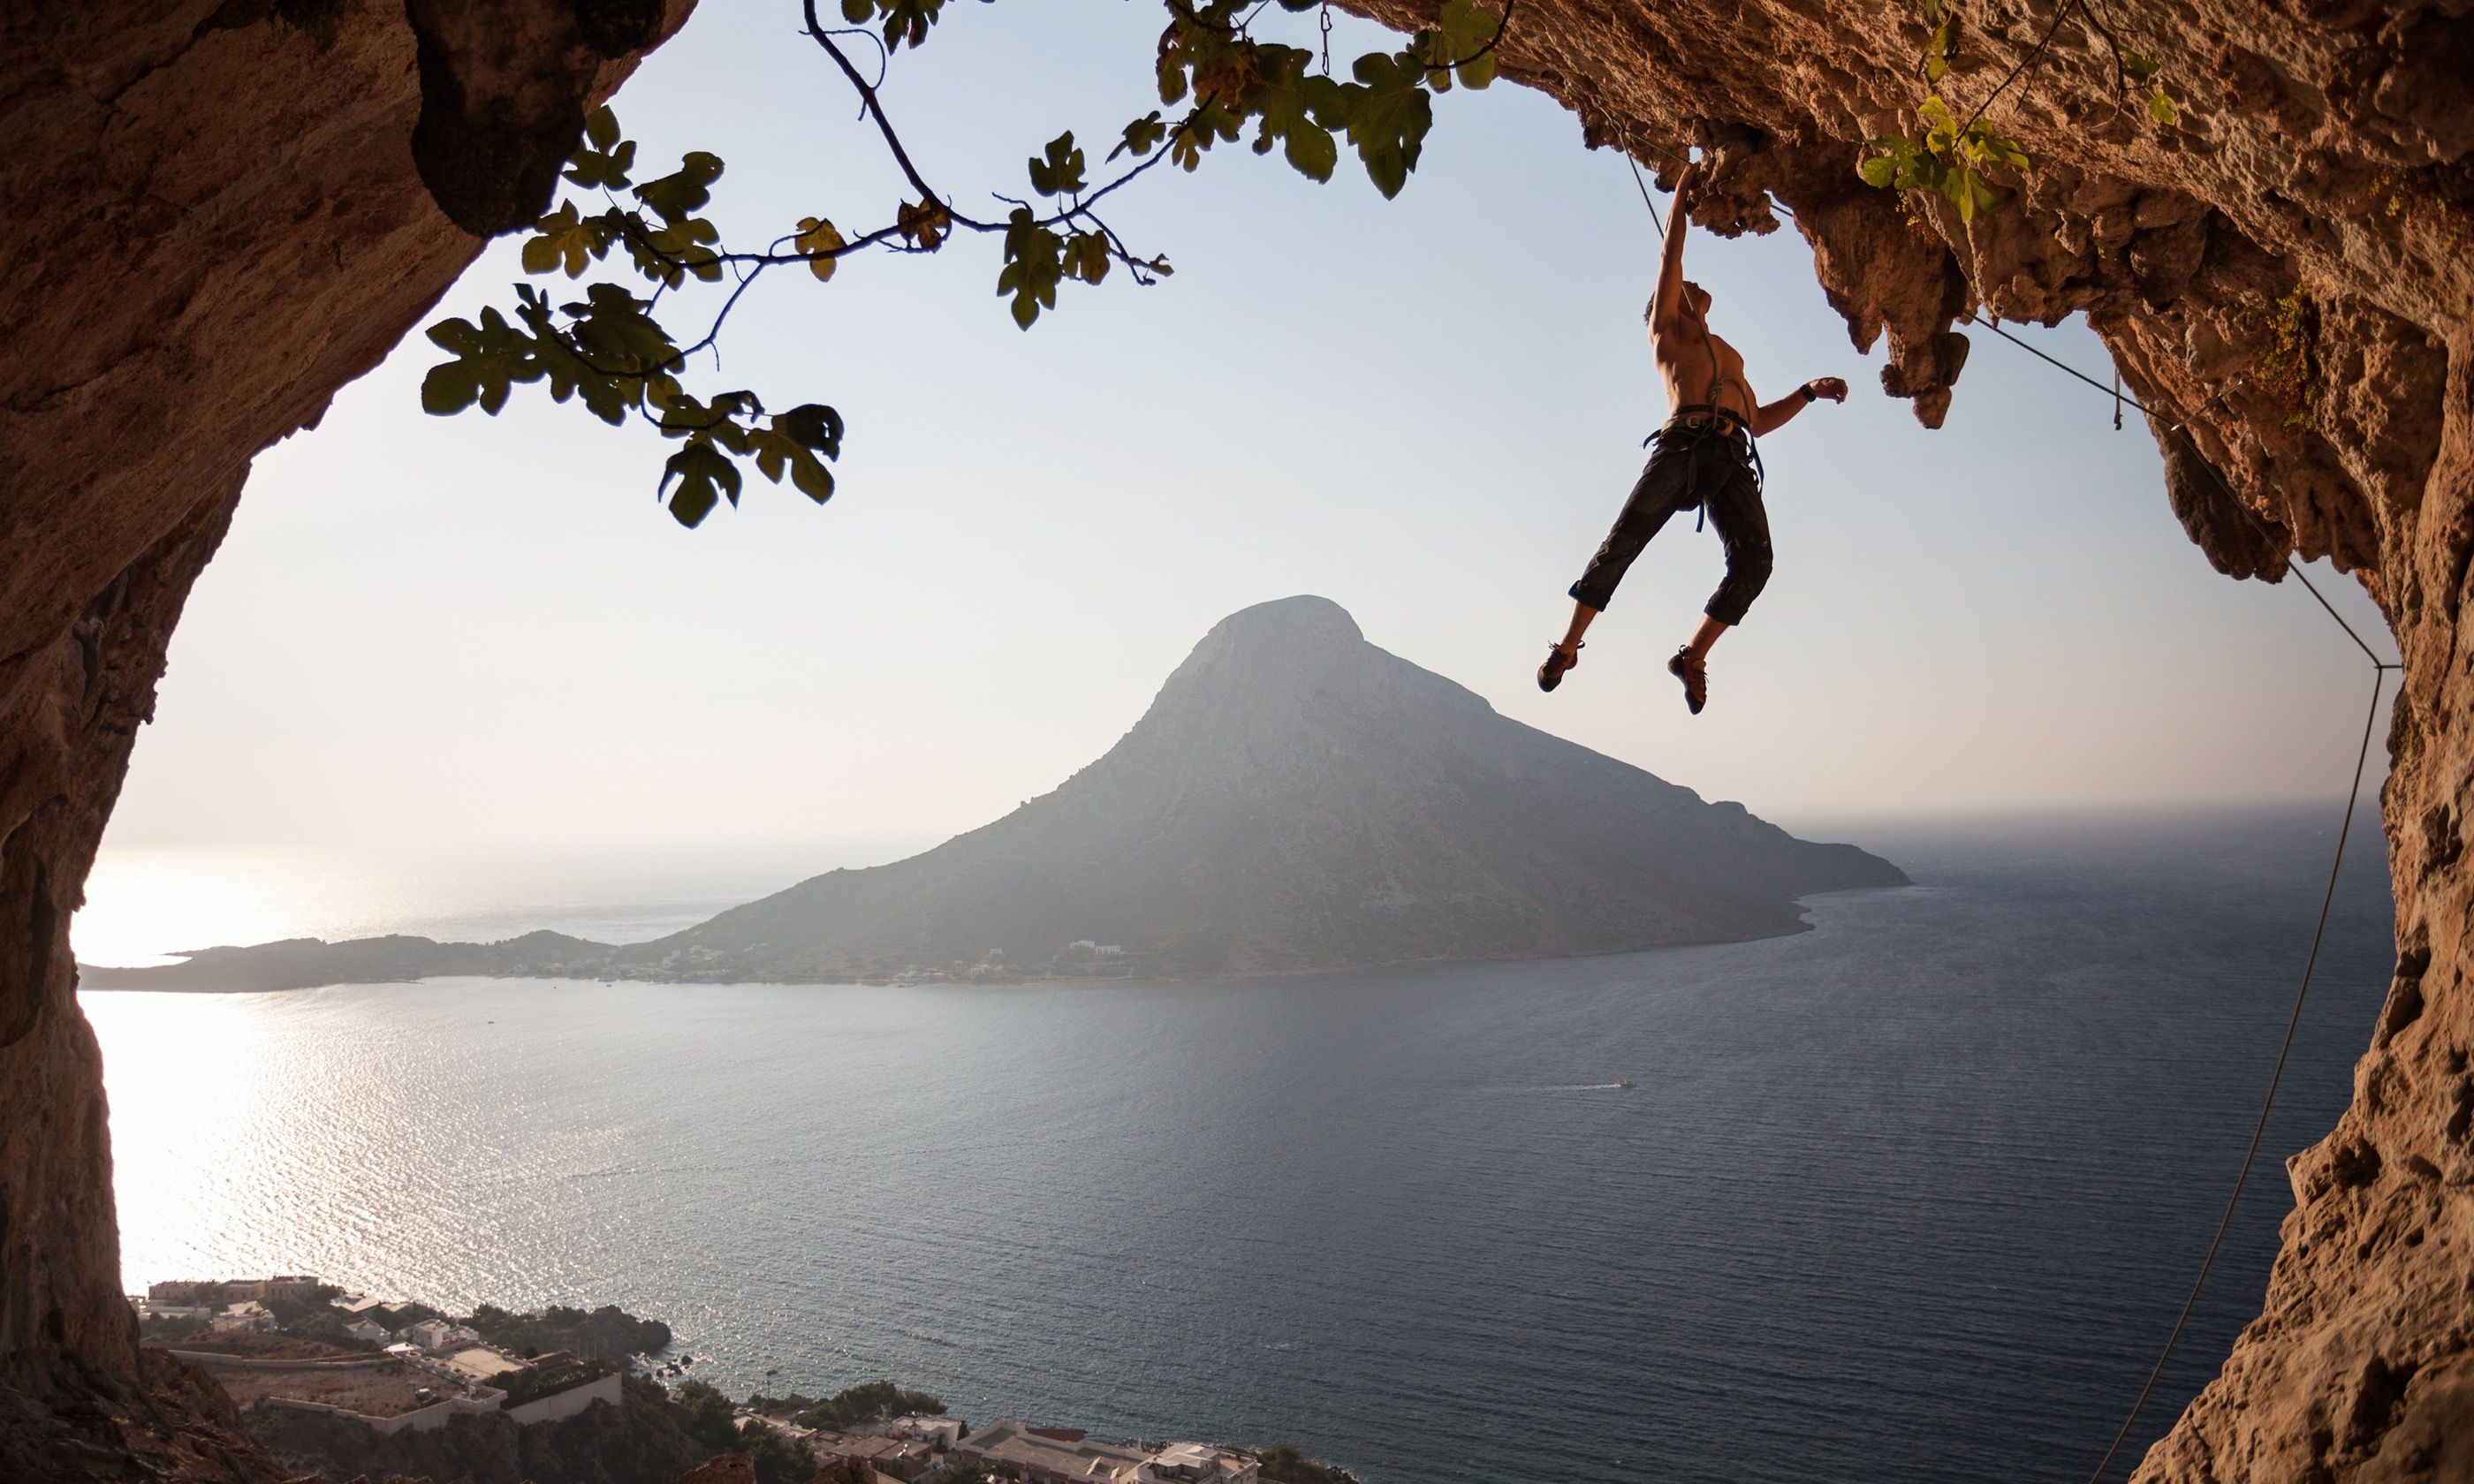 Climbing Kalymnos (Dreamstime)